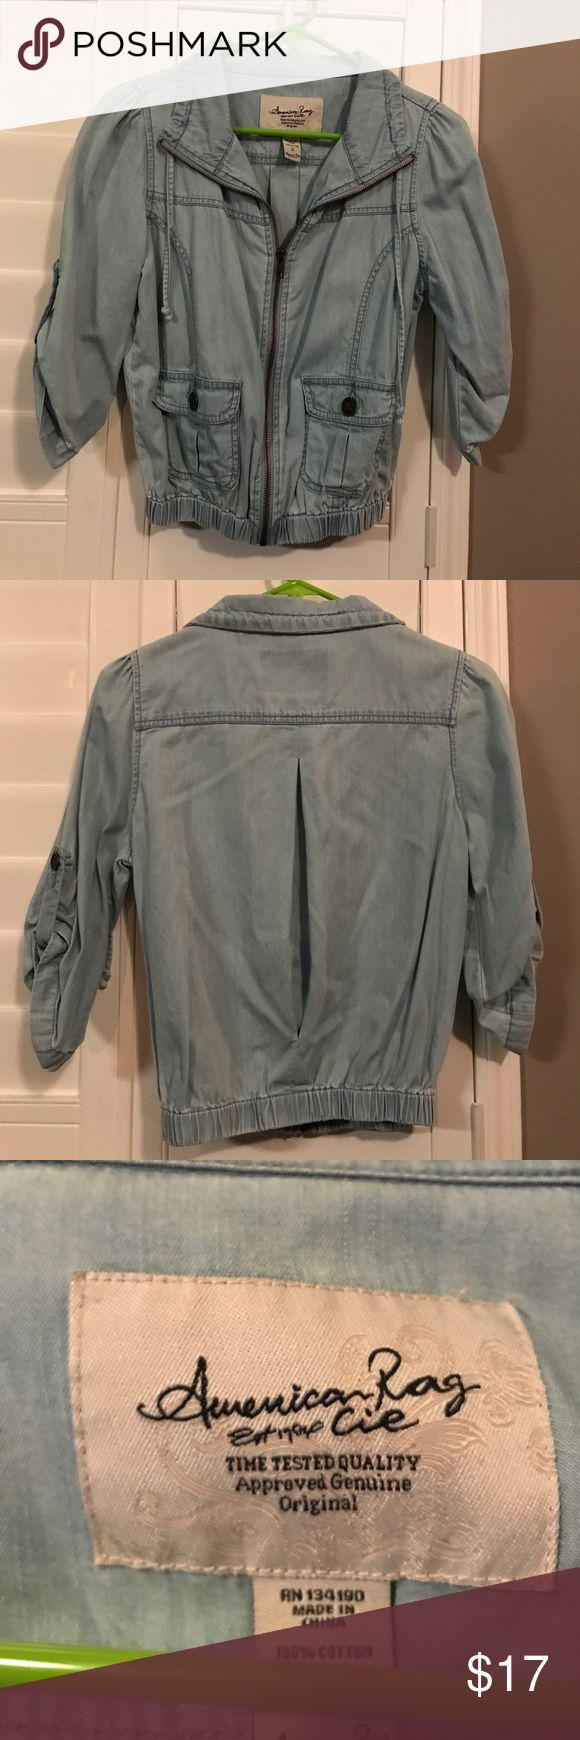 American rag- Jean jacket Thin jacket American Rag Jackets & Coats Jean Jackets